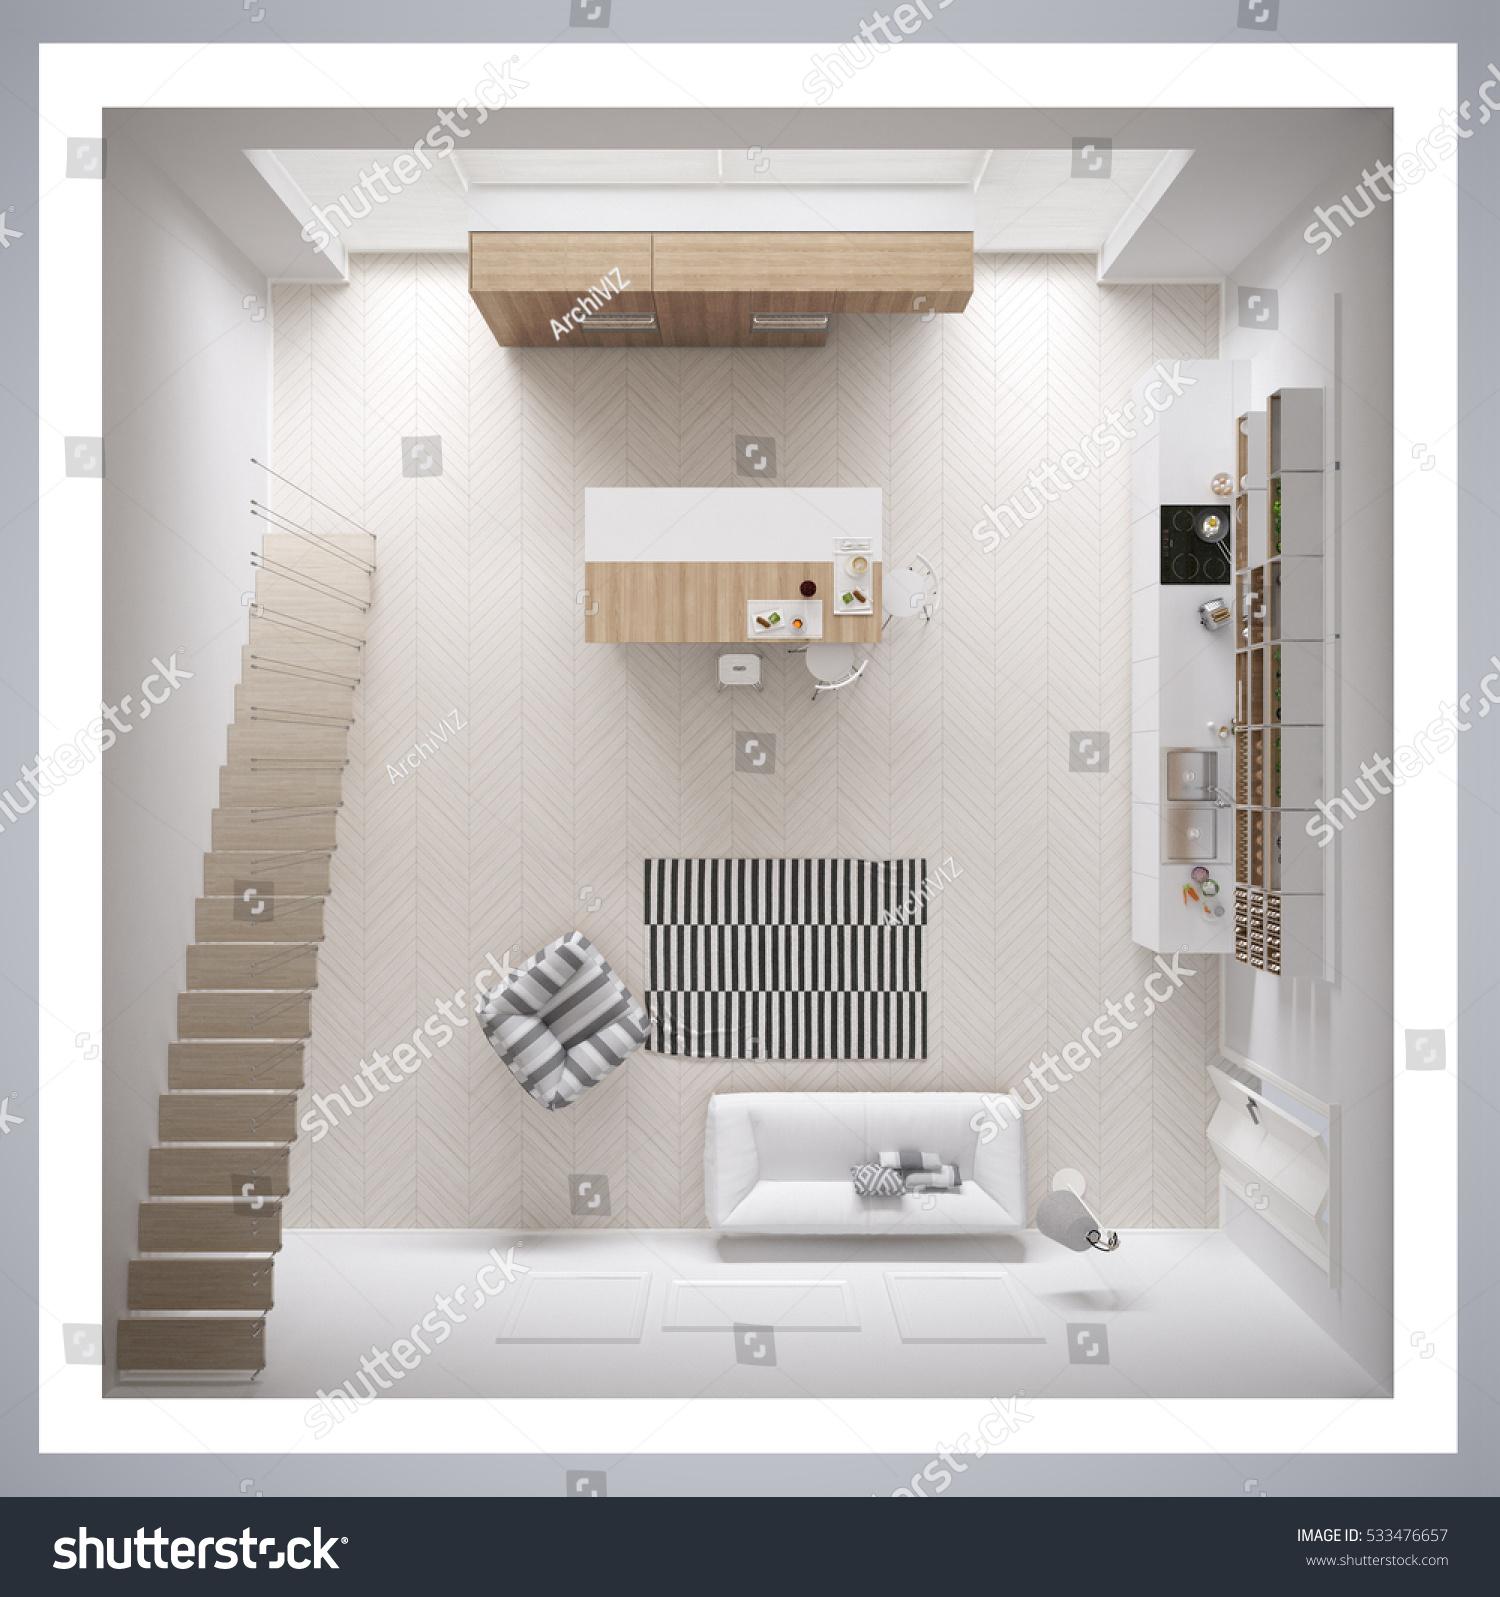 Scandinavian White Kitchen Minimalistic Interior Design Cross Section Top View 3d Illustration